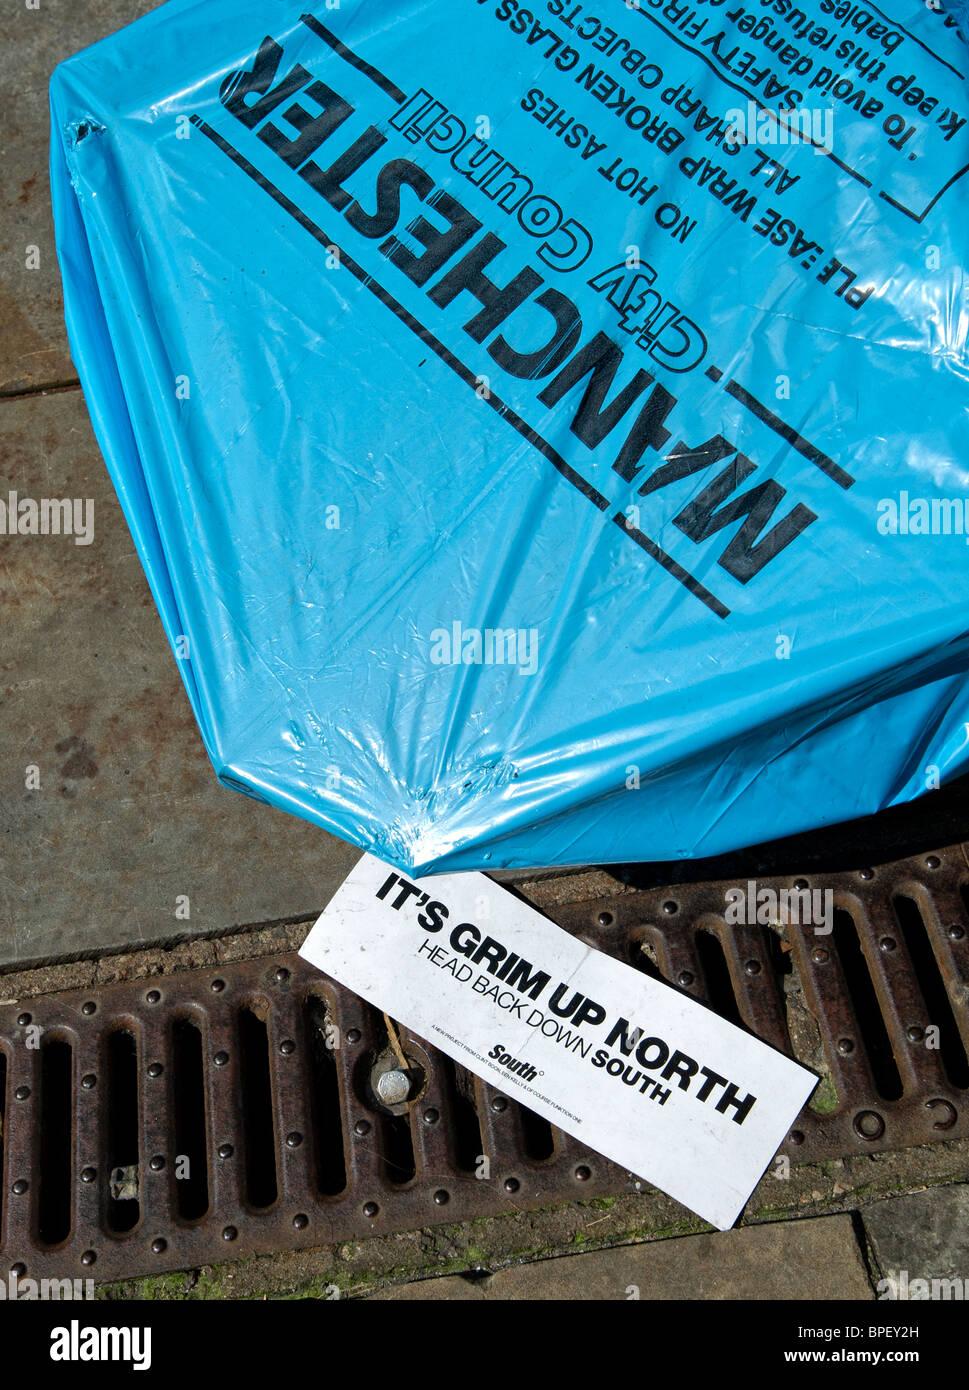 Refuse sack alongside sign saying 'It's Grim Up North' - Stock Image